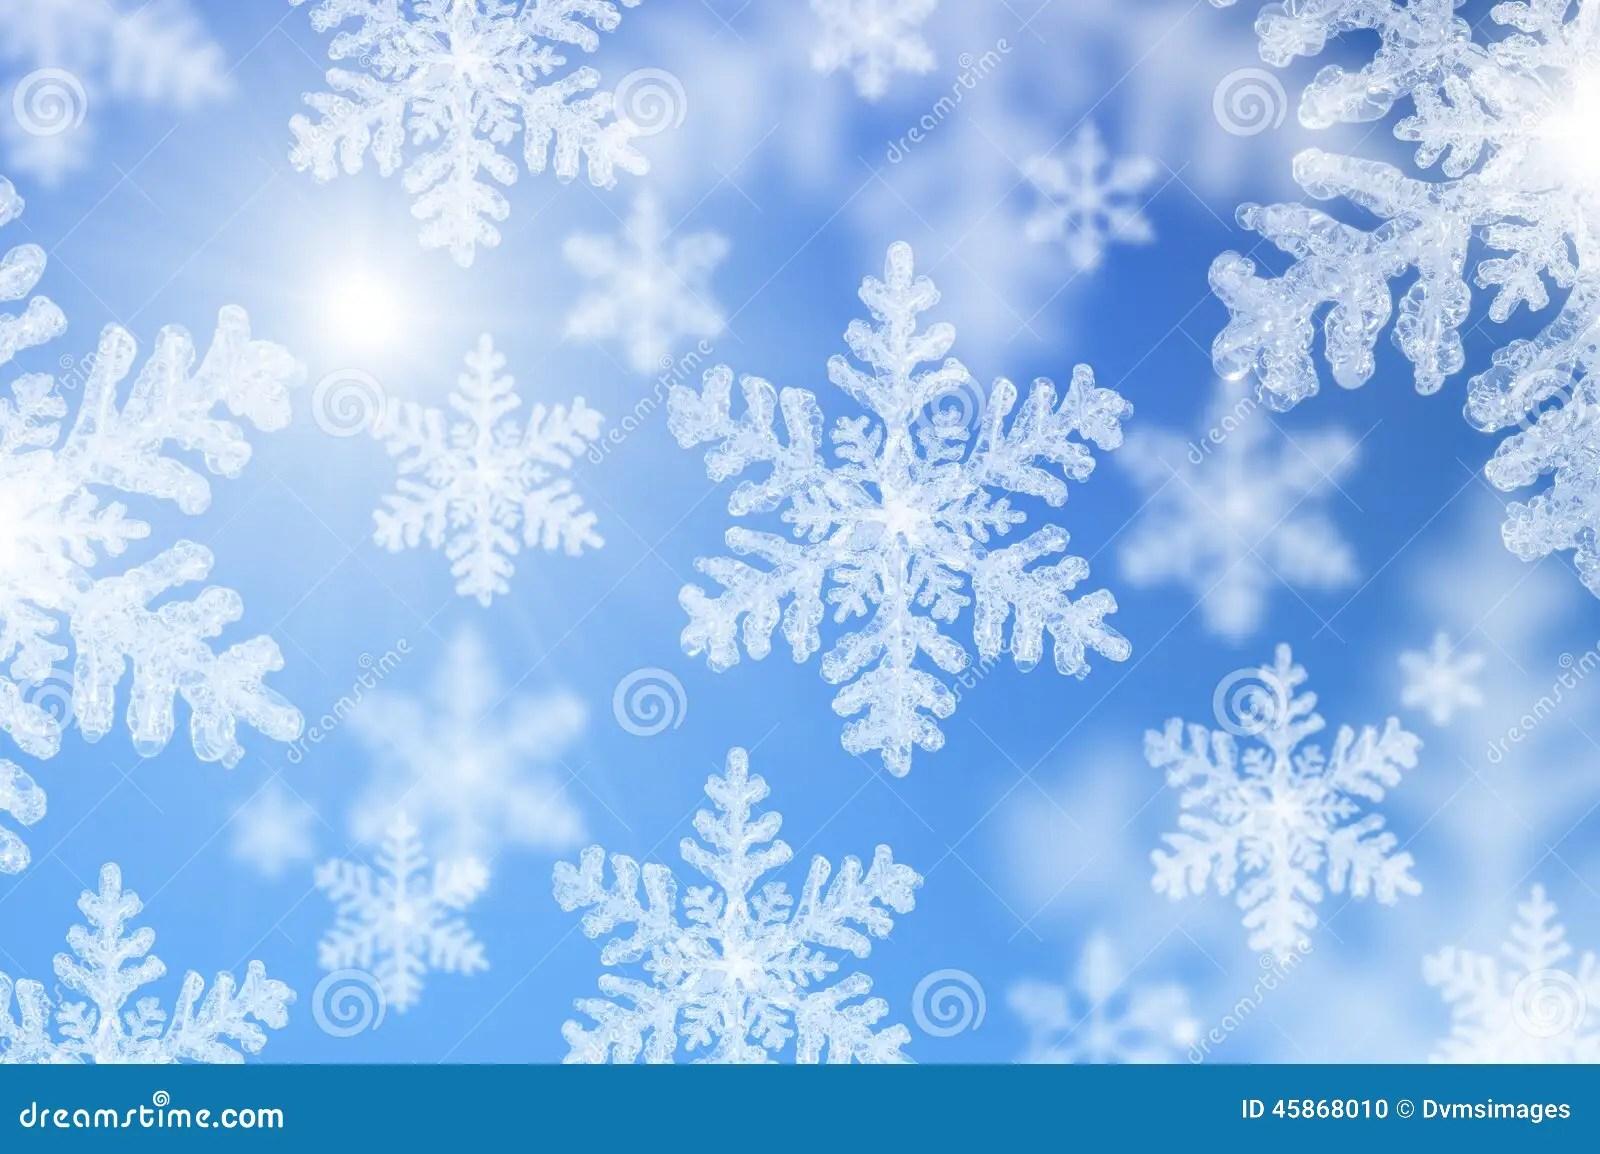 Snow Falling Background Wallpaper Falling Snowflakes Stock Photo Image 45868010